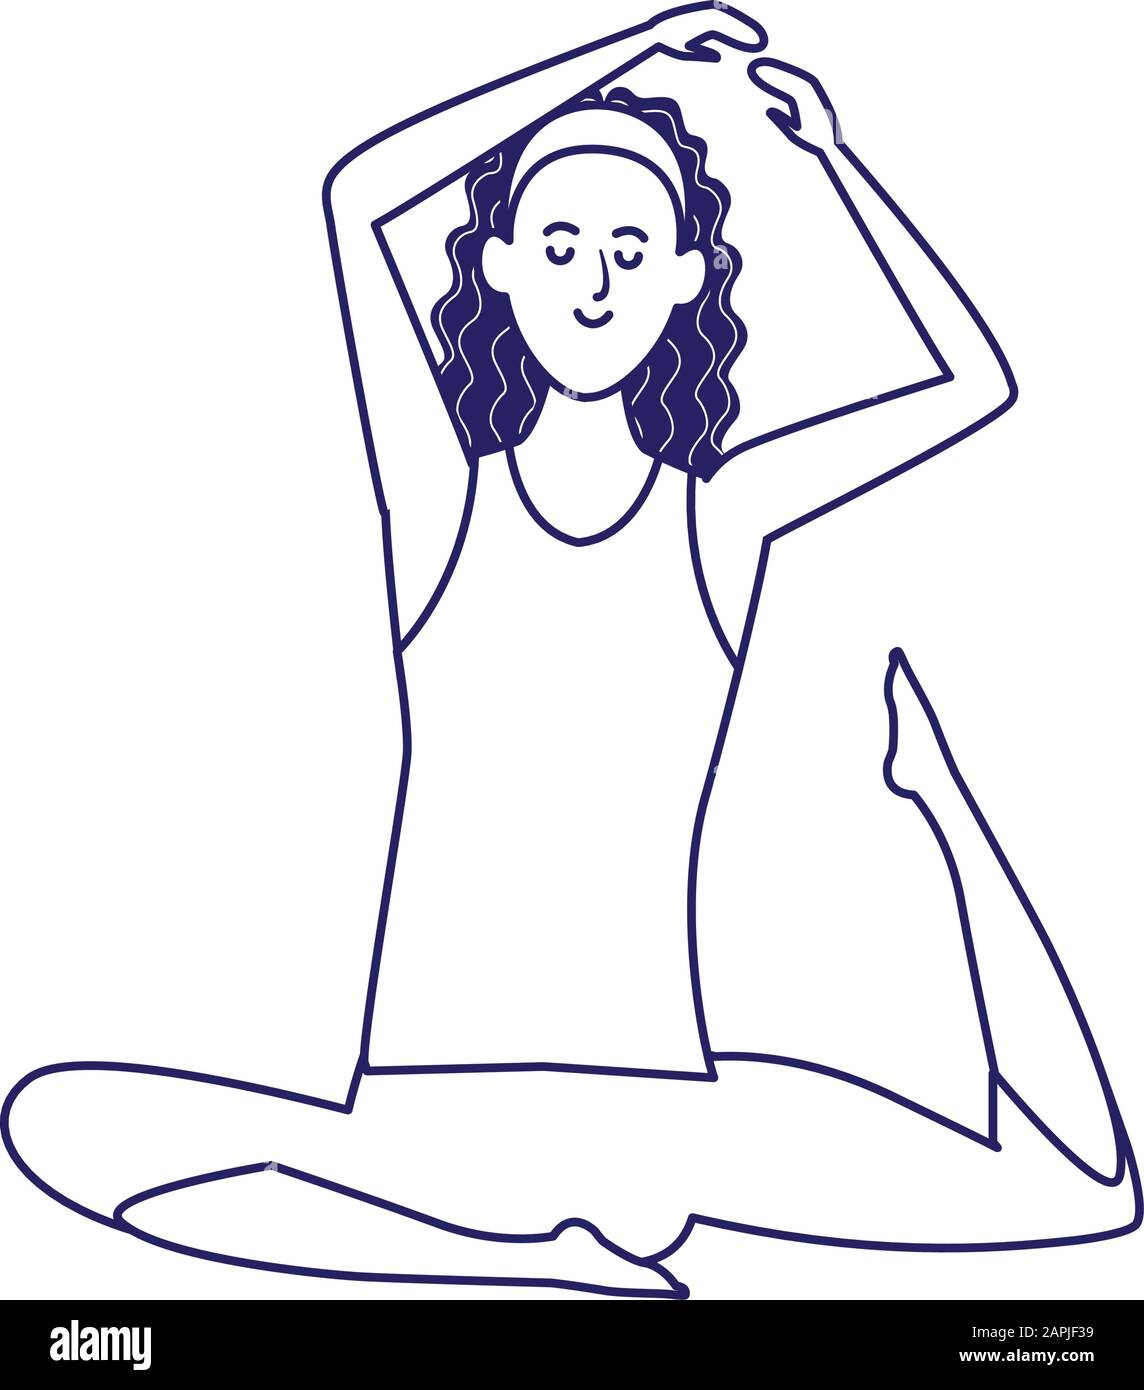 Cartoon Girl Practicing Yoga Icon Flat Design Stock Vector Image Art Alamy